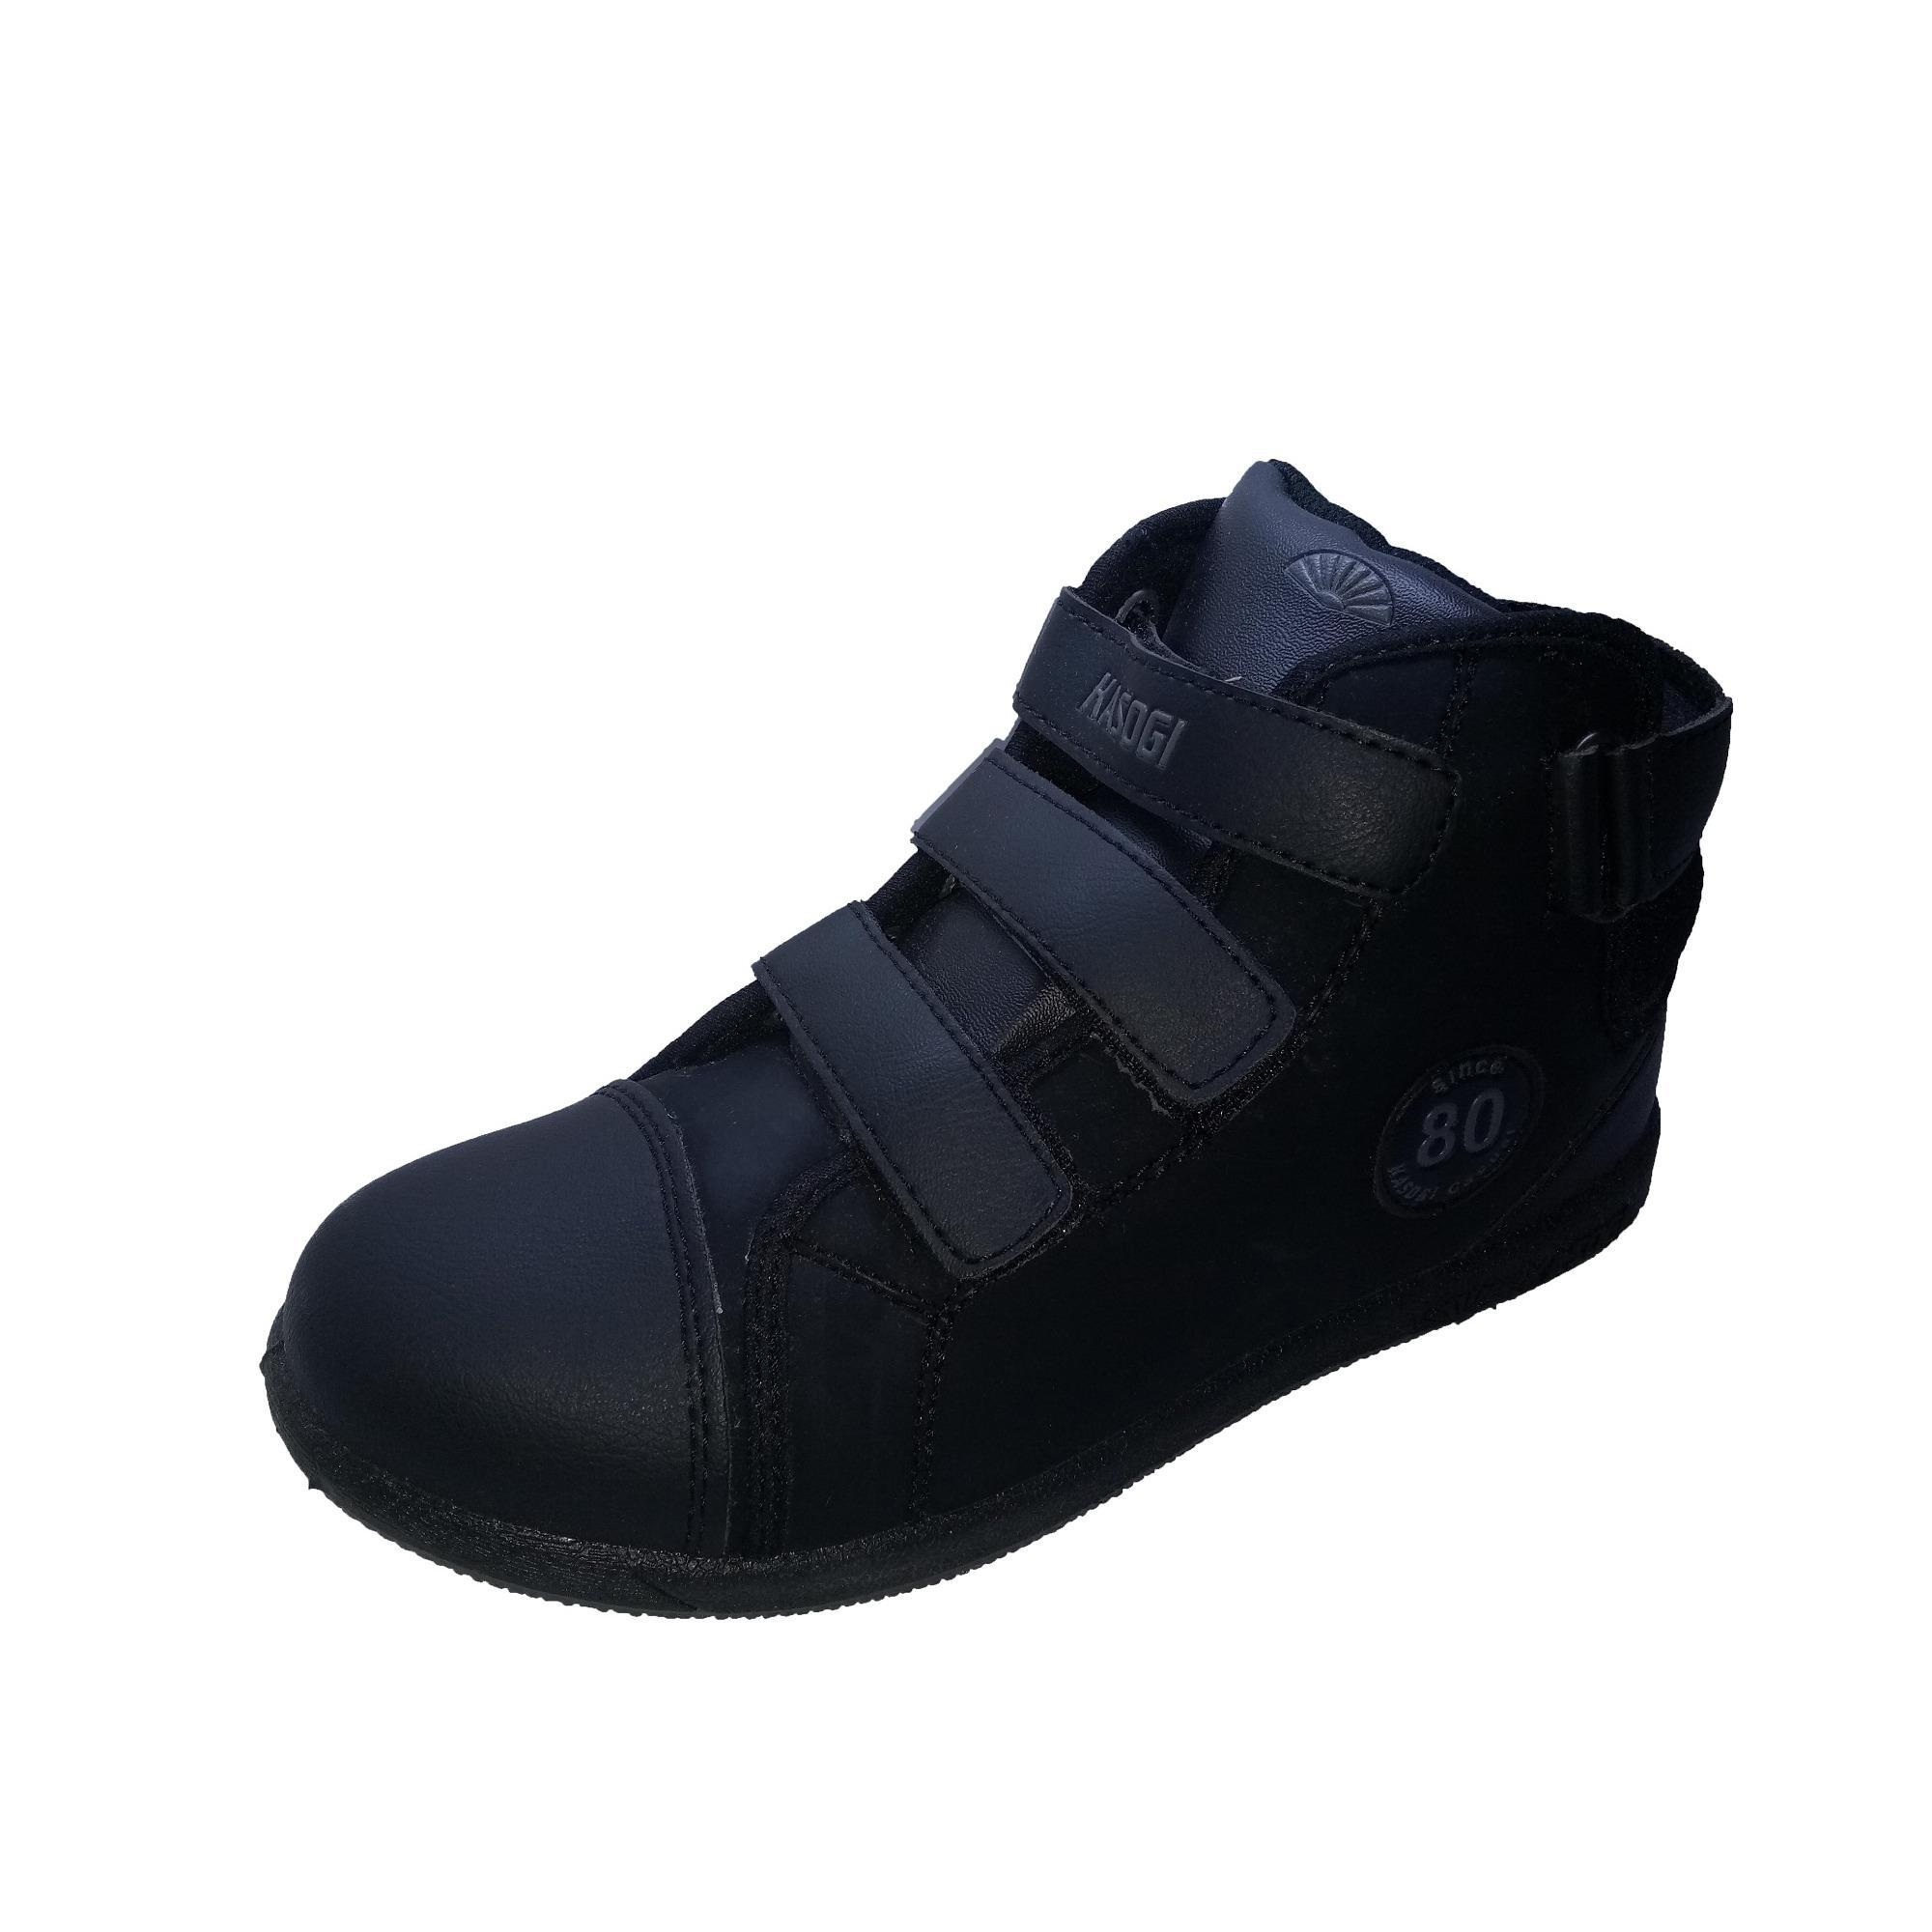 Sepatu Kasogi Frank - Sepatu Anak - Sepatu Unisex - Sepatu Pria - Sepatu Wanita - Sepatu Sekolah - Sepatu Casual - Sepatu Sneakers - Sepatu Murah